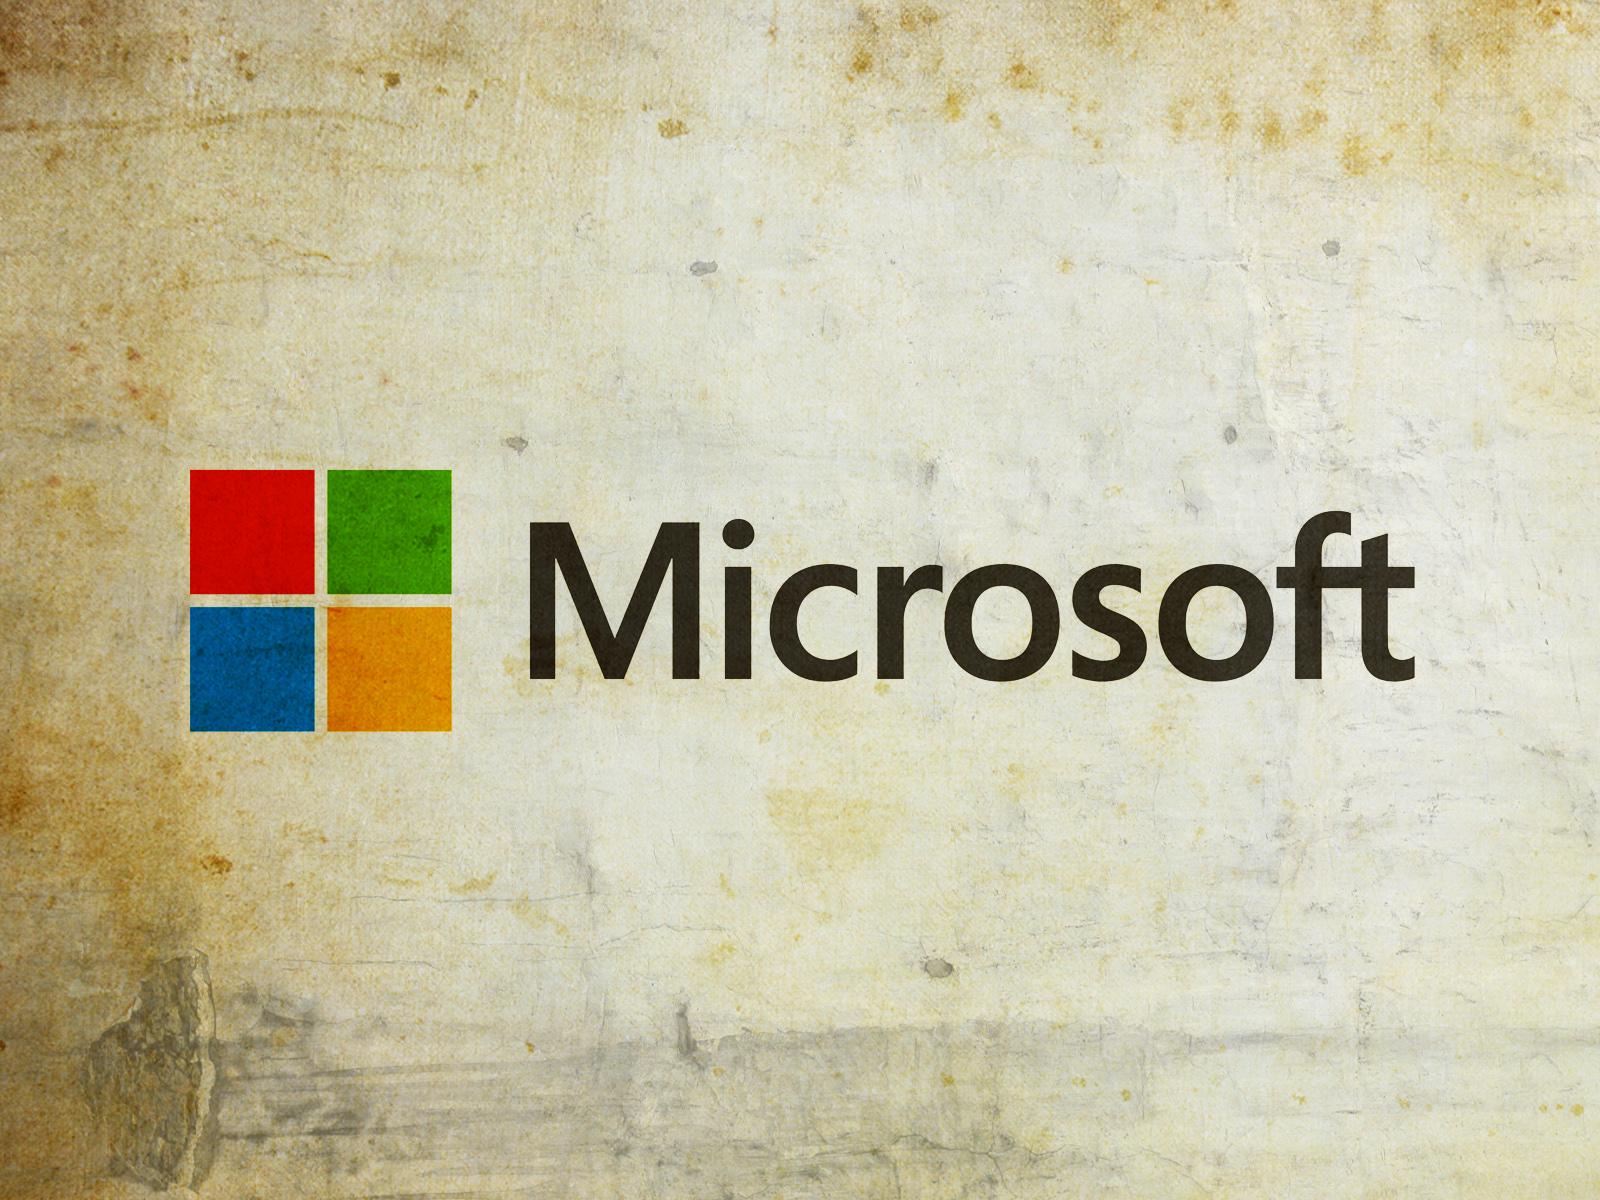 Desktop backgrounds download microsoft 1600x1200